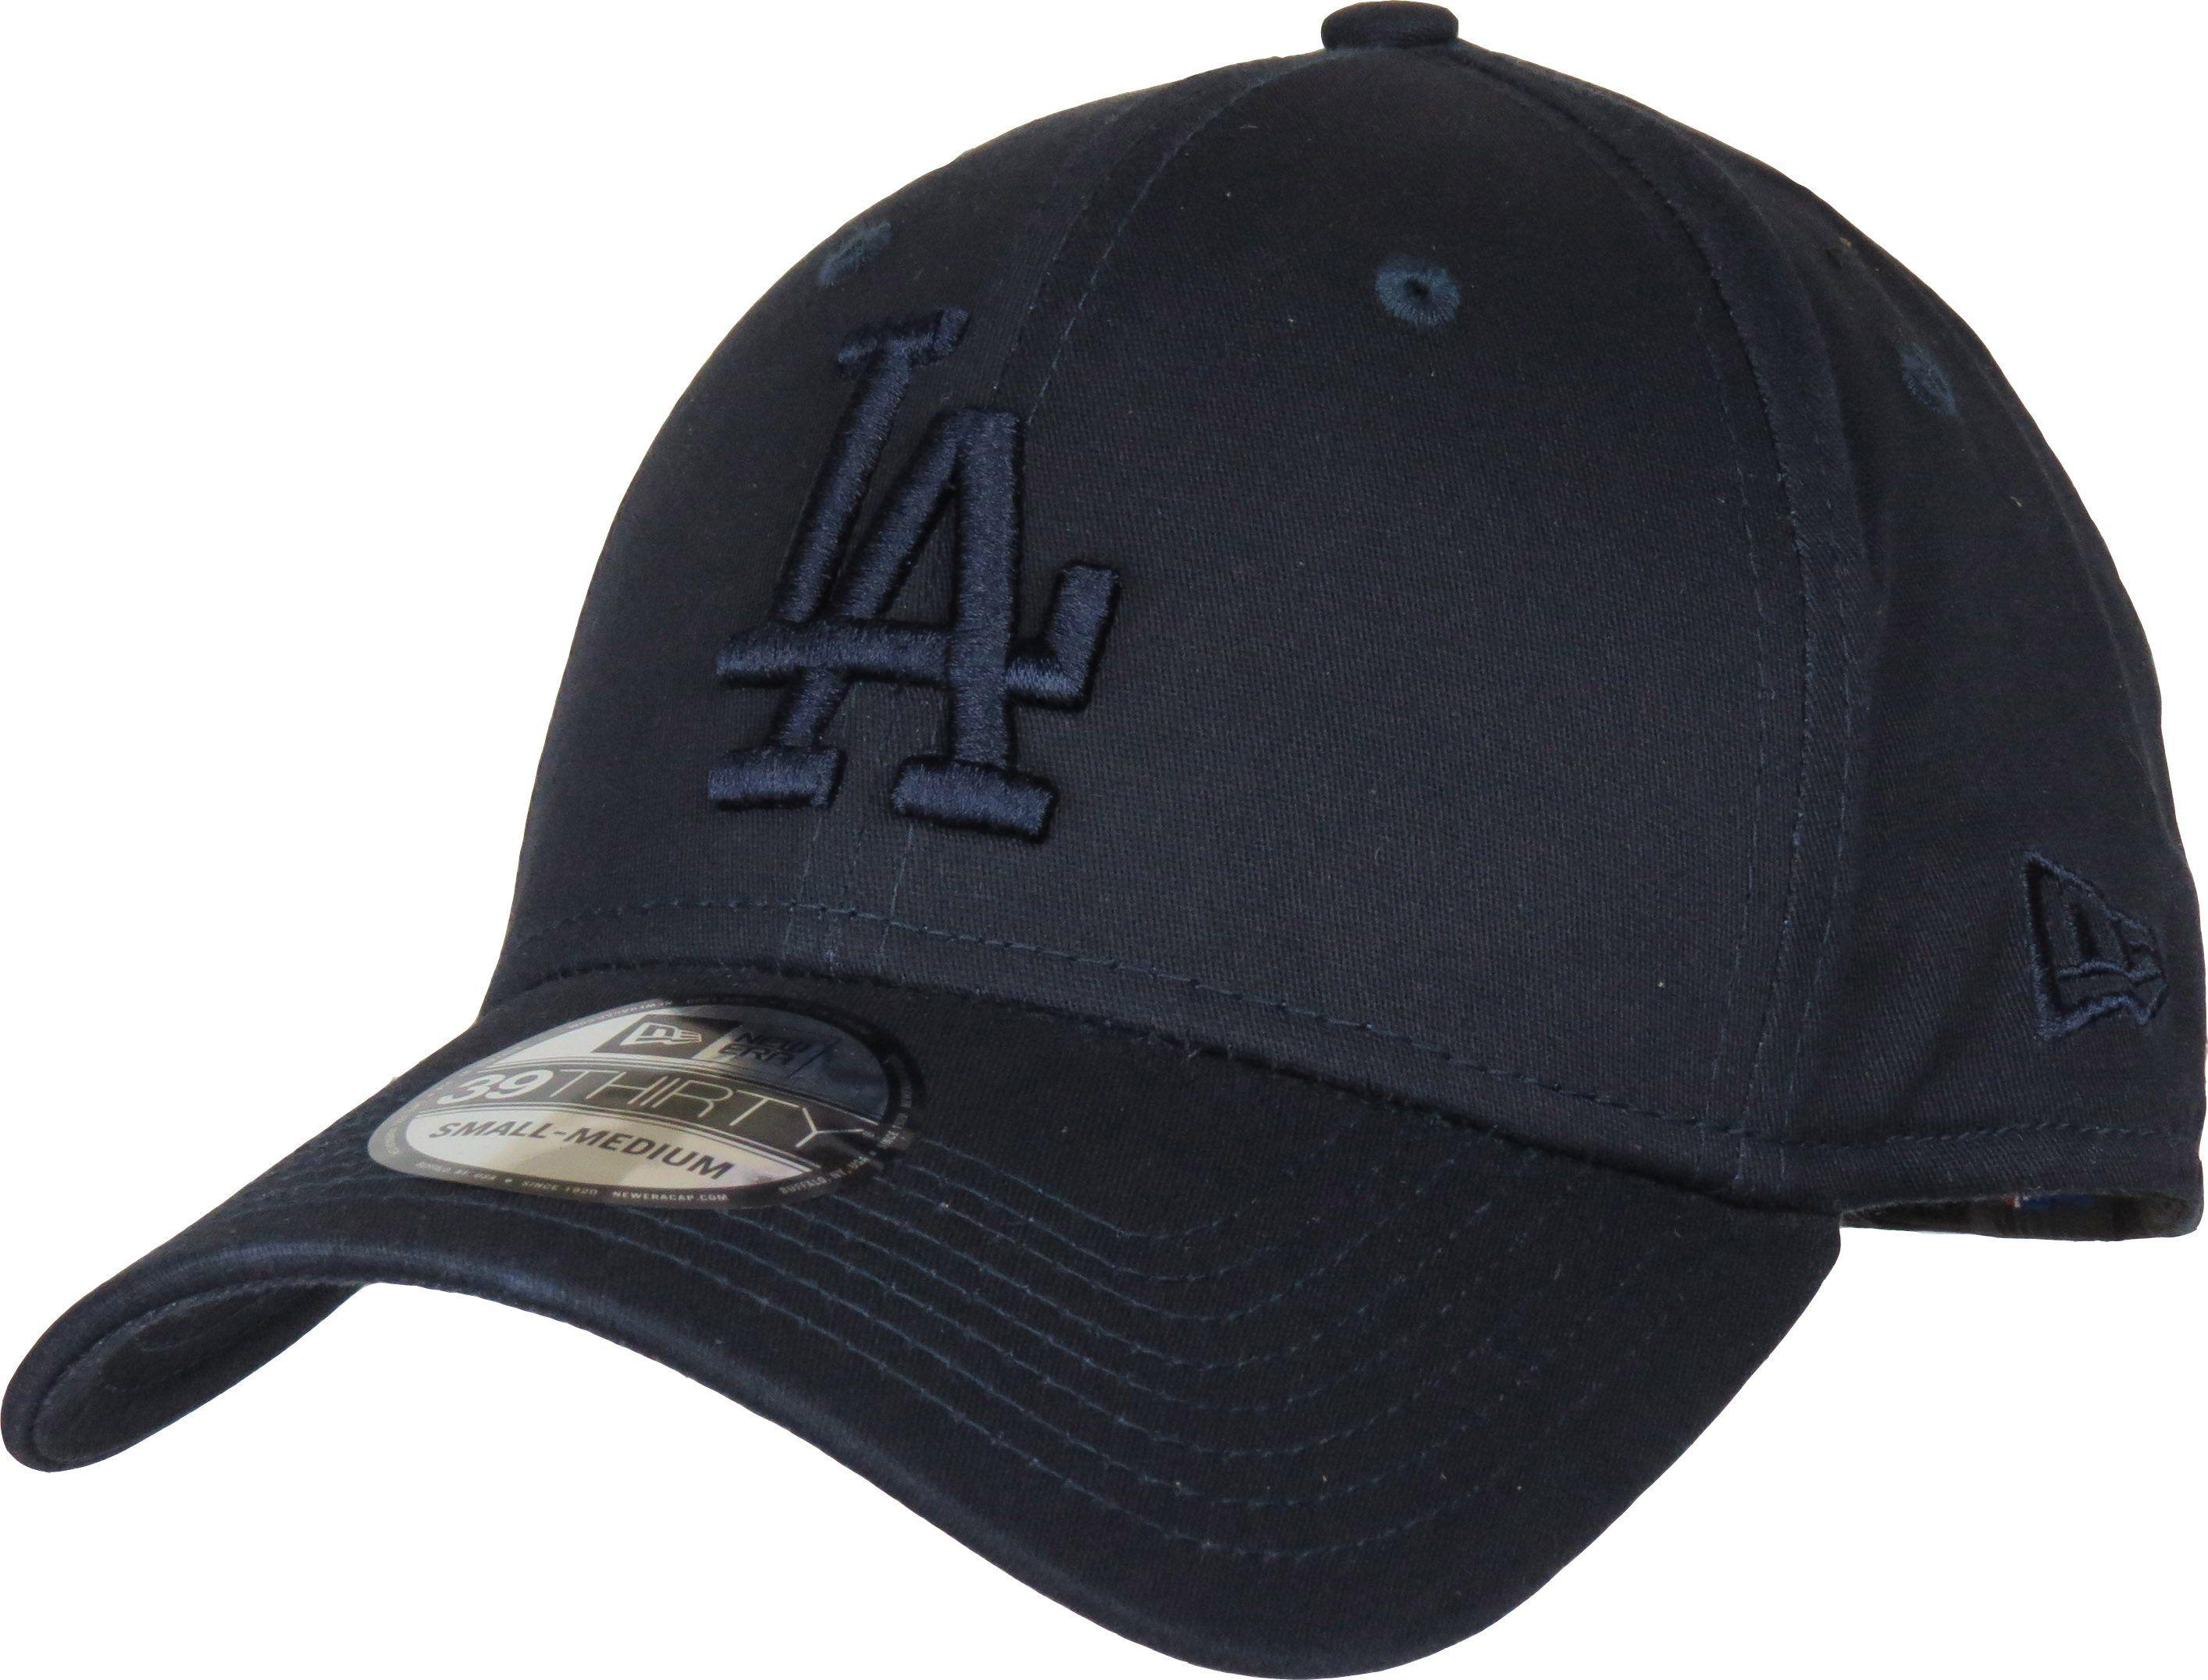 Free Shipping! 2 Custom Logo New Era 39Thirty Stretch fitted Black Hat//Cap